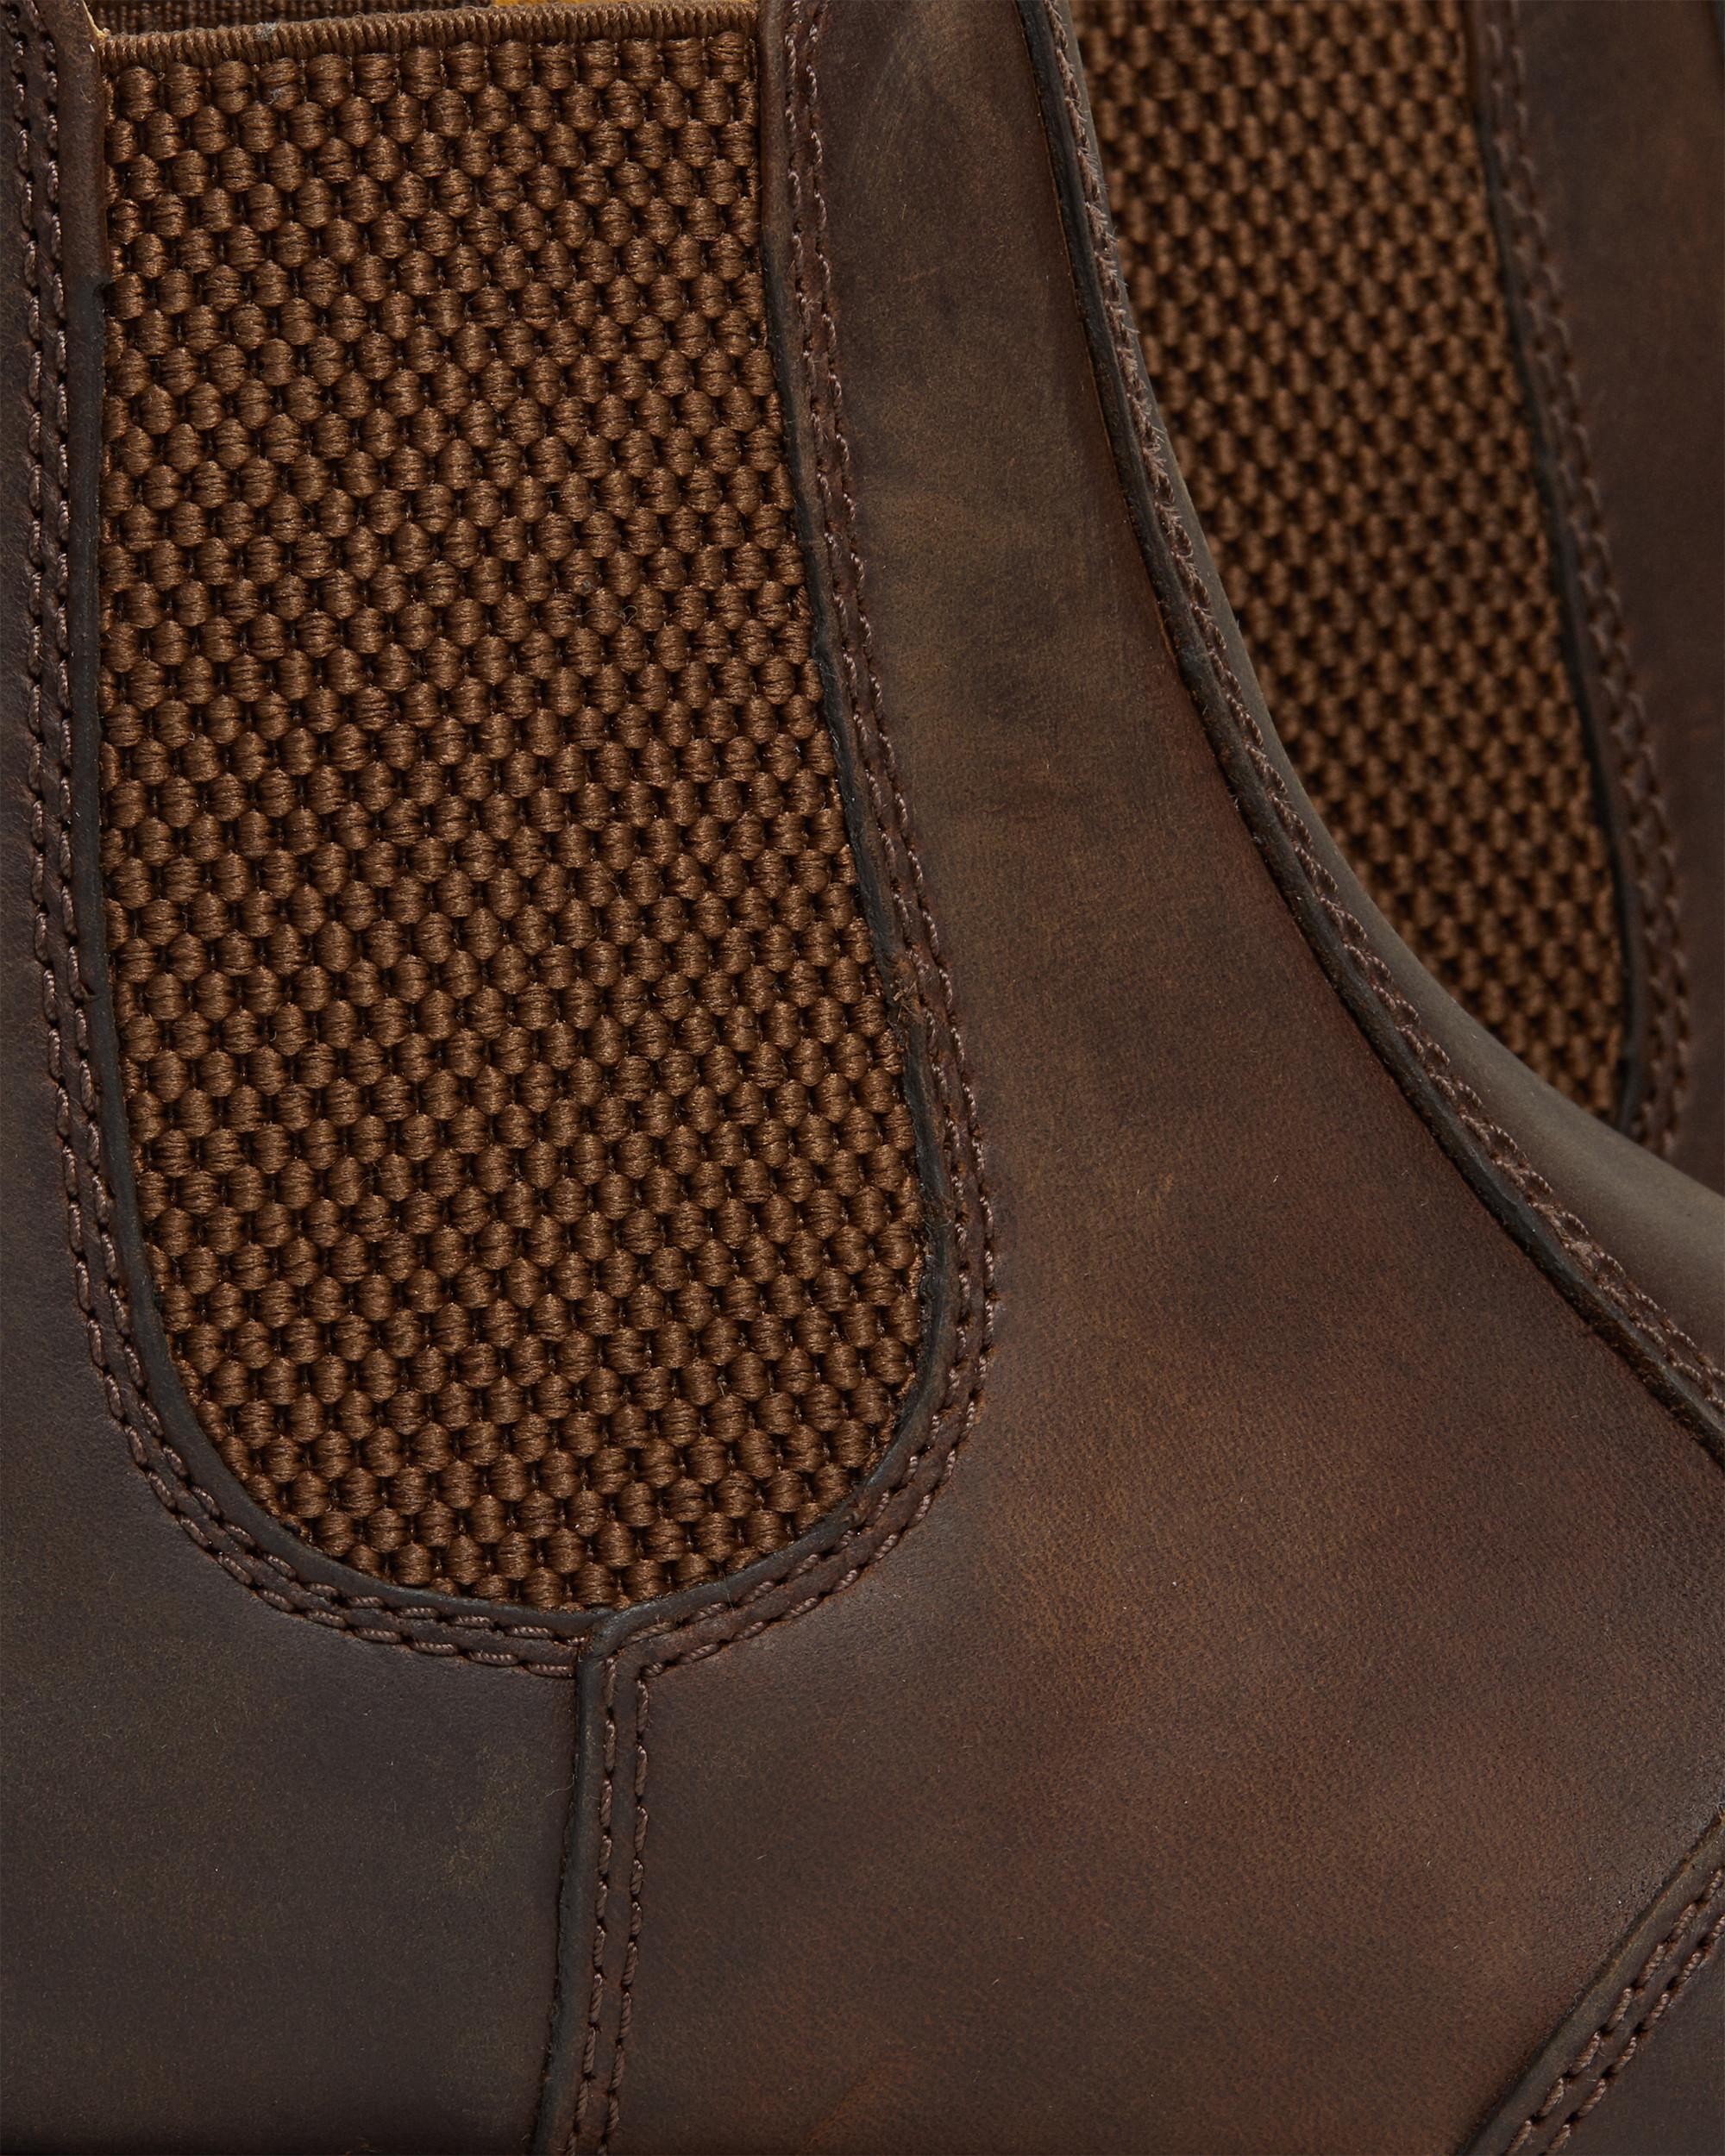 DR MARTENS 1461 gaucho crazy horse shoe UK Size 8 Free Postage